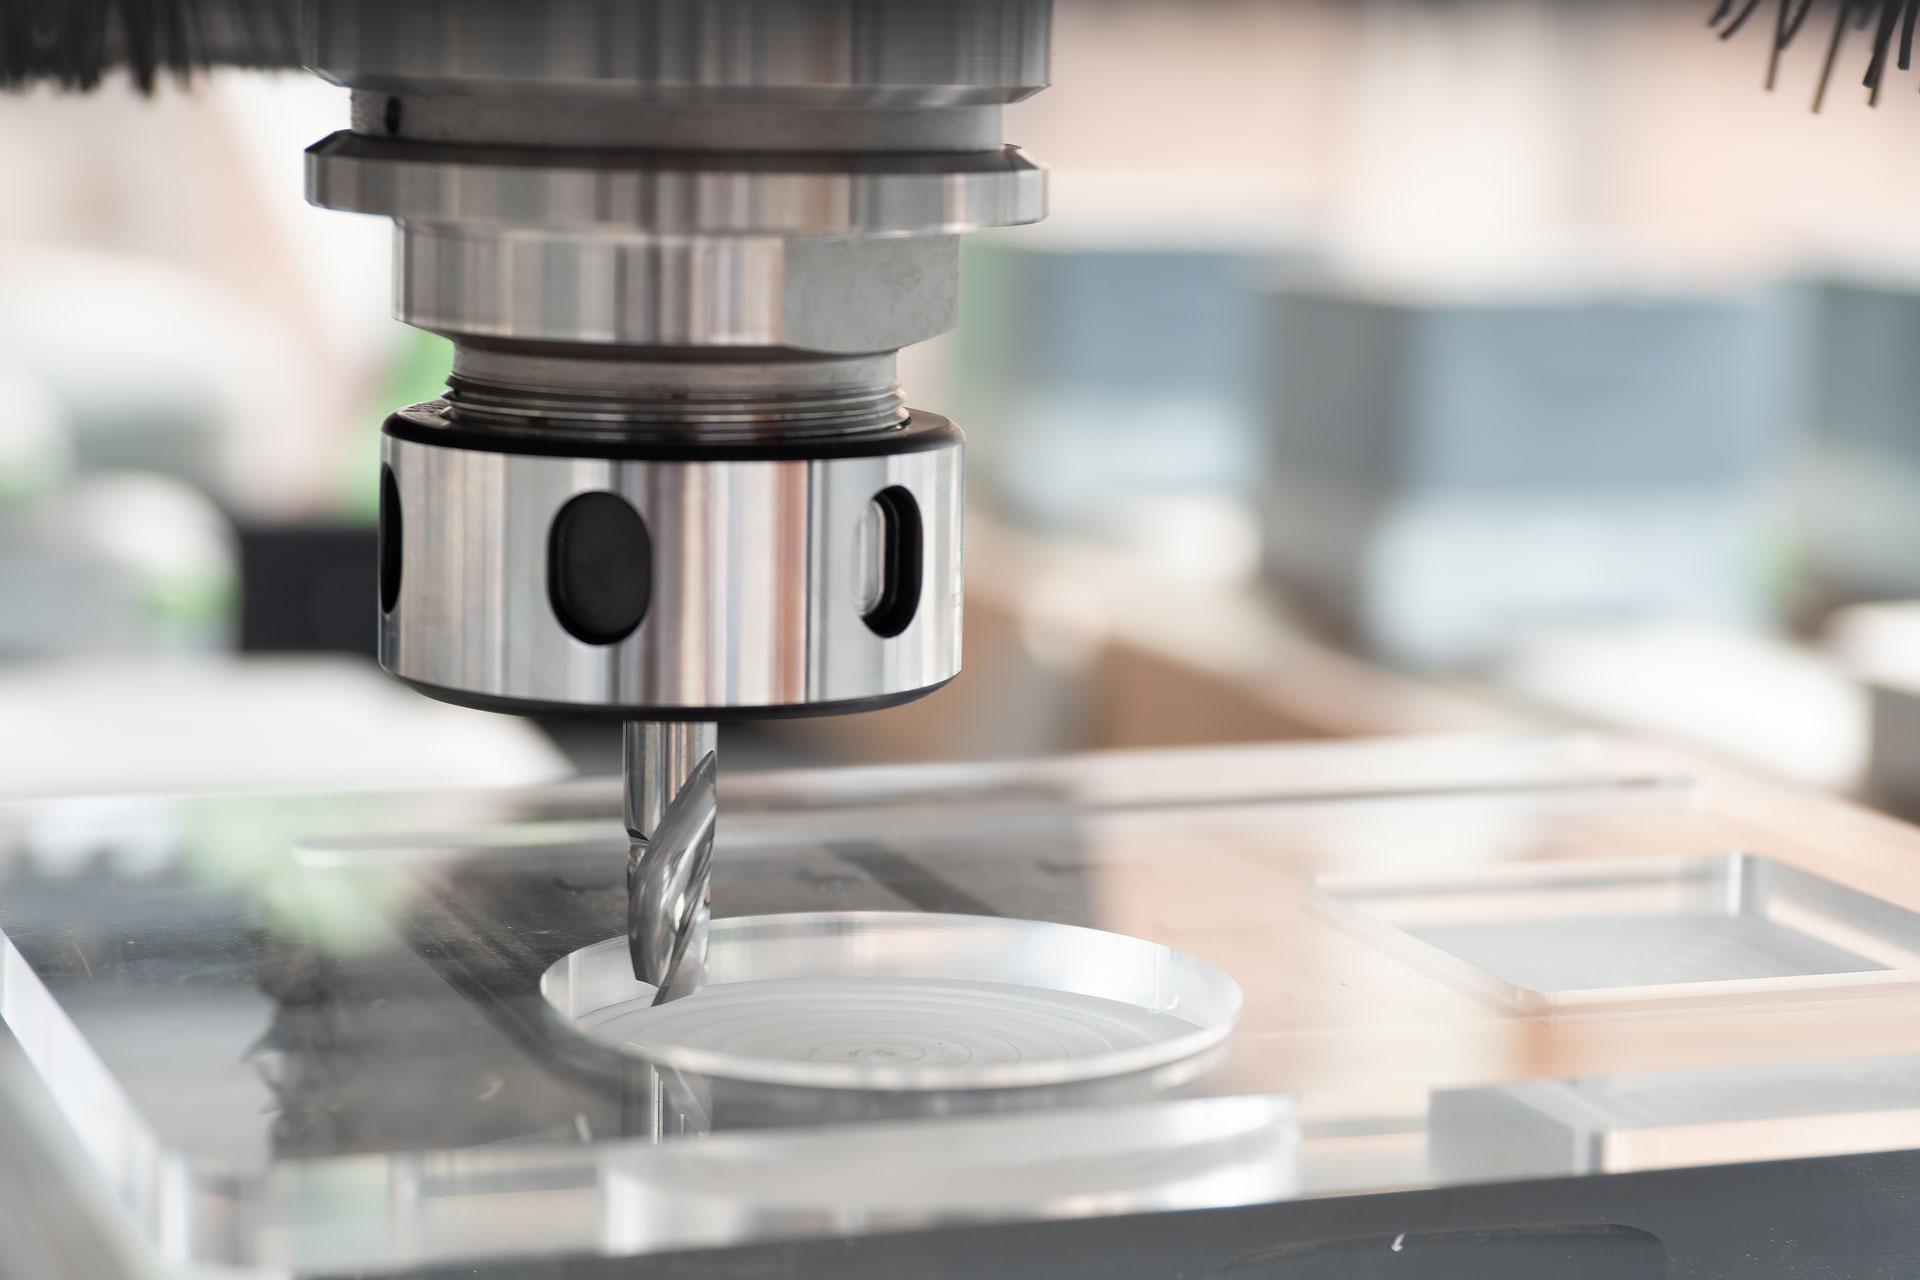 Technik Fertigungsverfahren Elastomere Formteile (Gummiformteile)